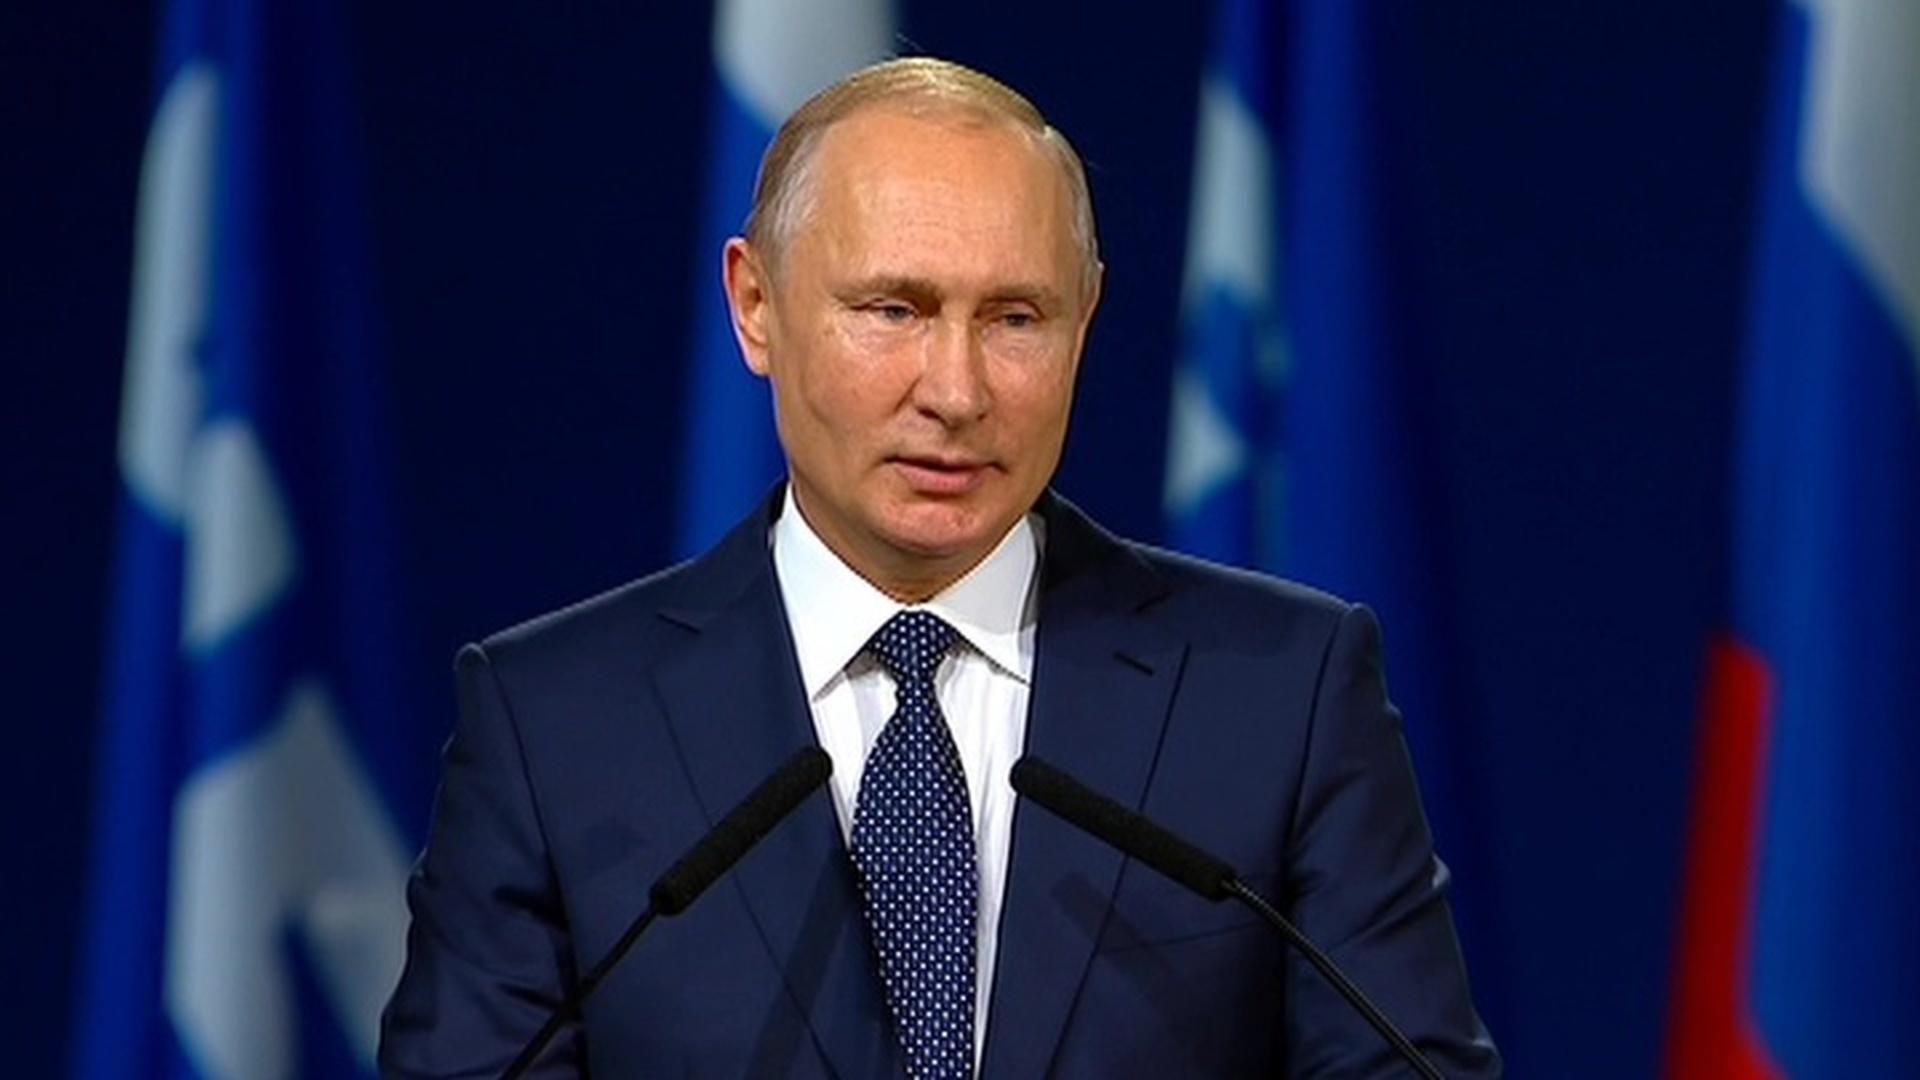 Владимир Путин посетит финал чемпионата мира по футболу